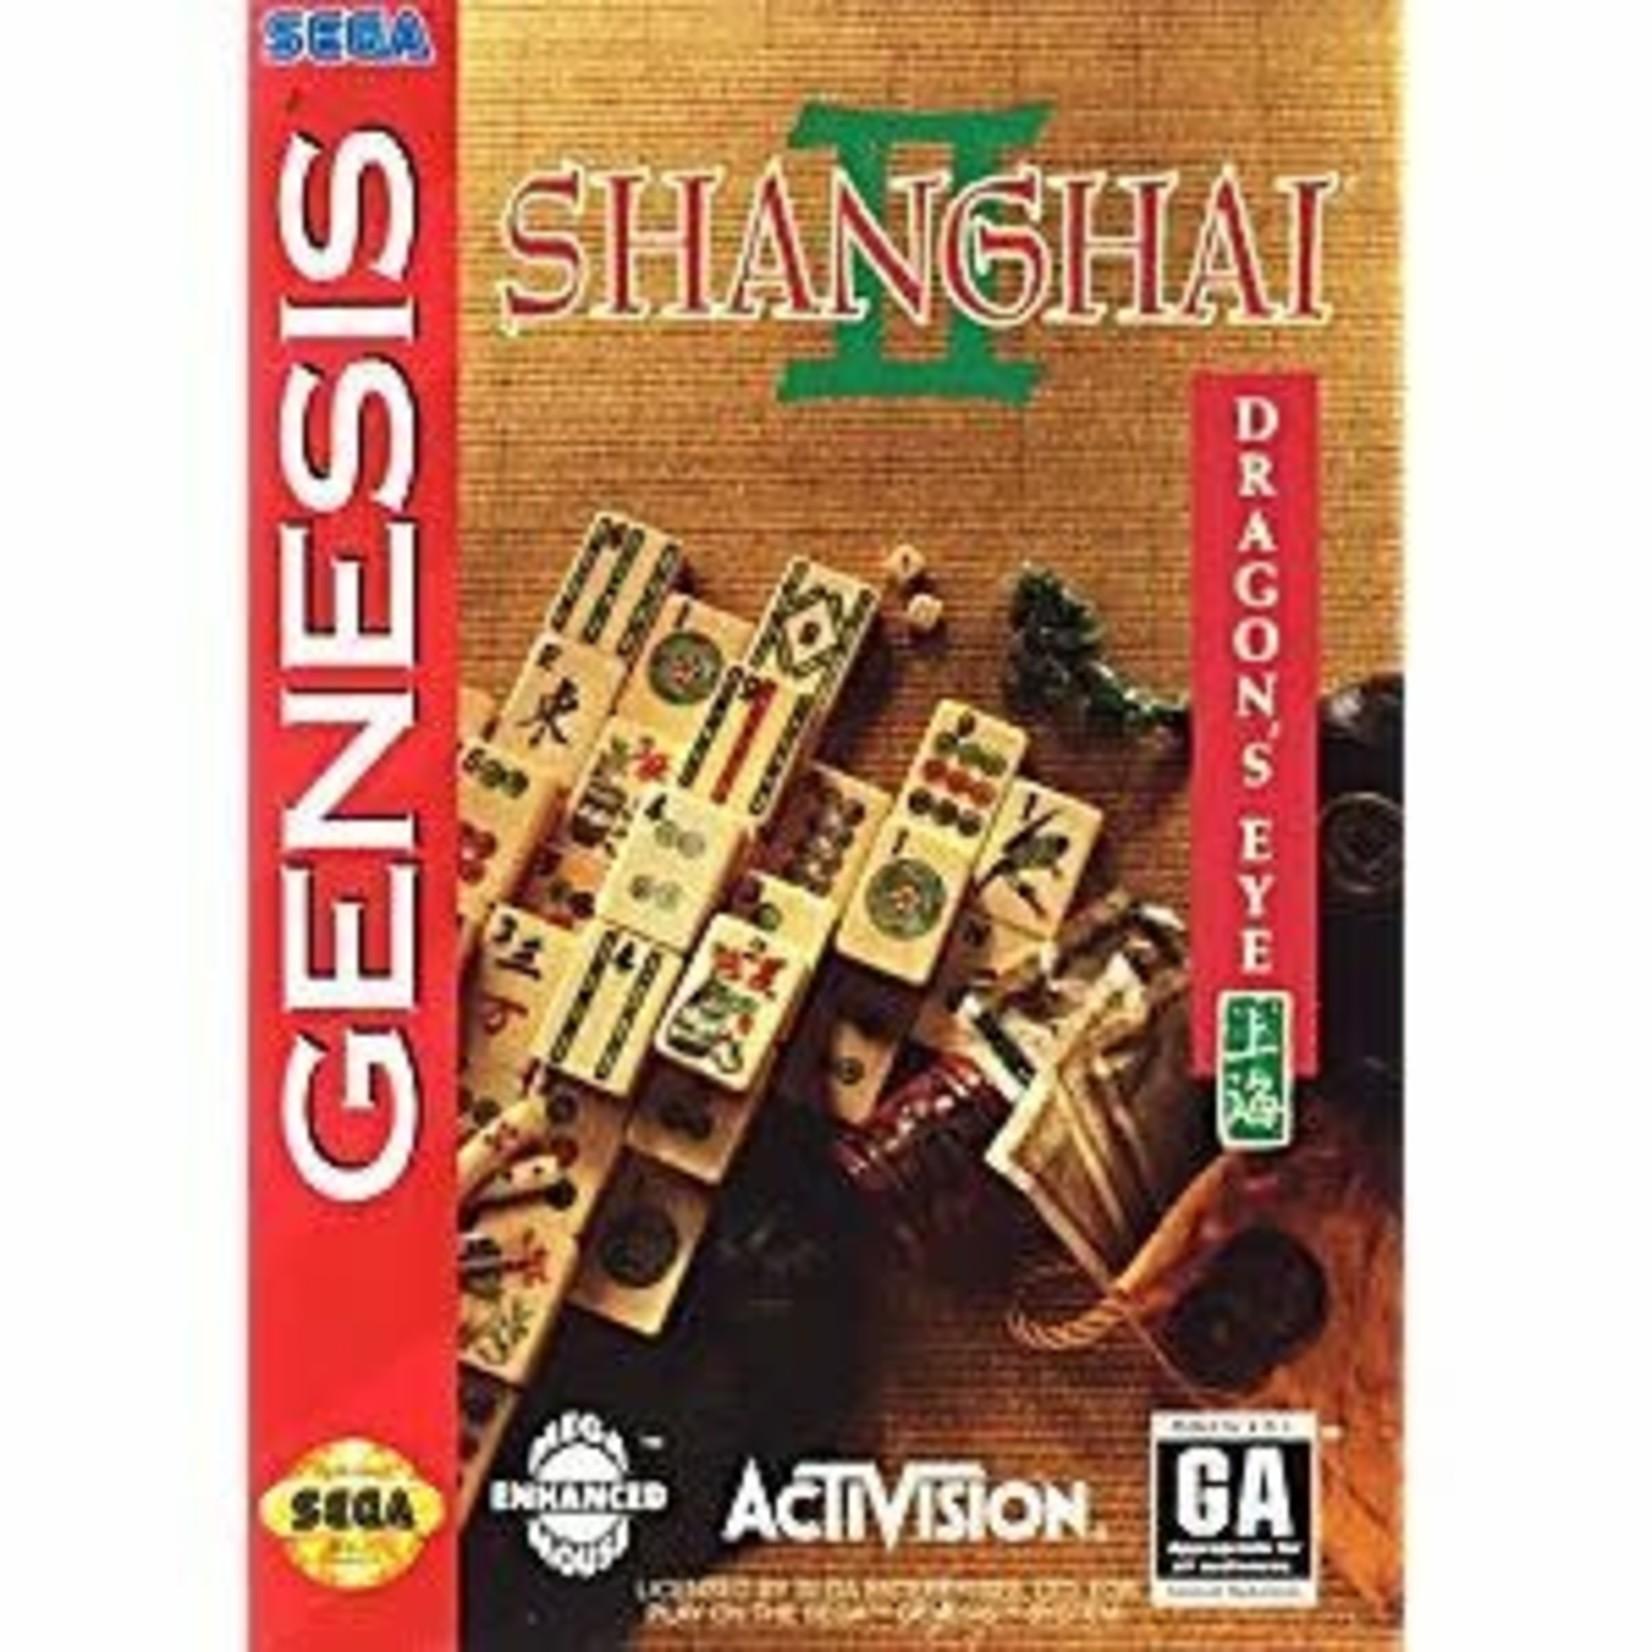 sgu-shanghai 2 Dragon's Eye (cartridge)